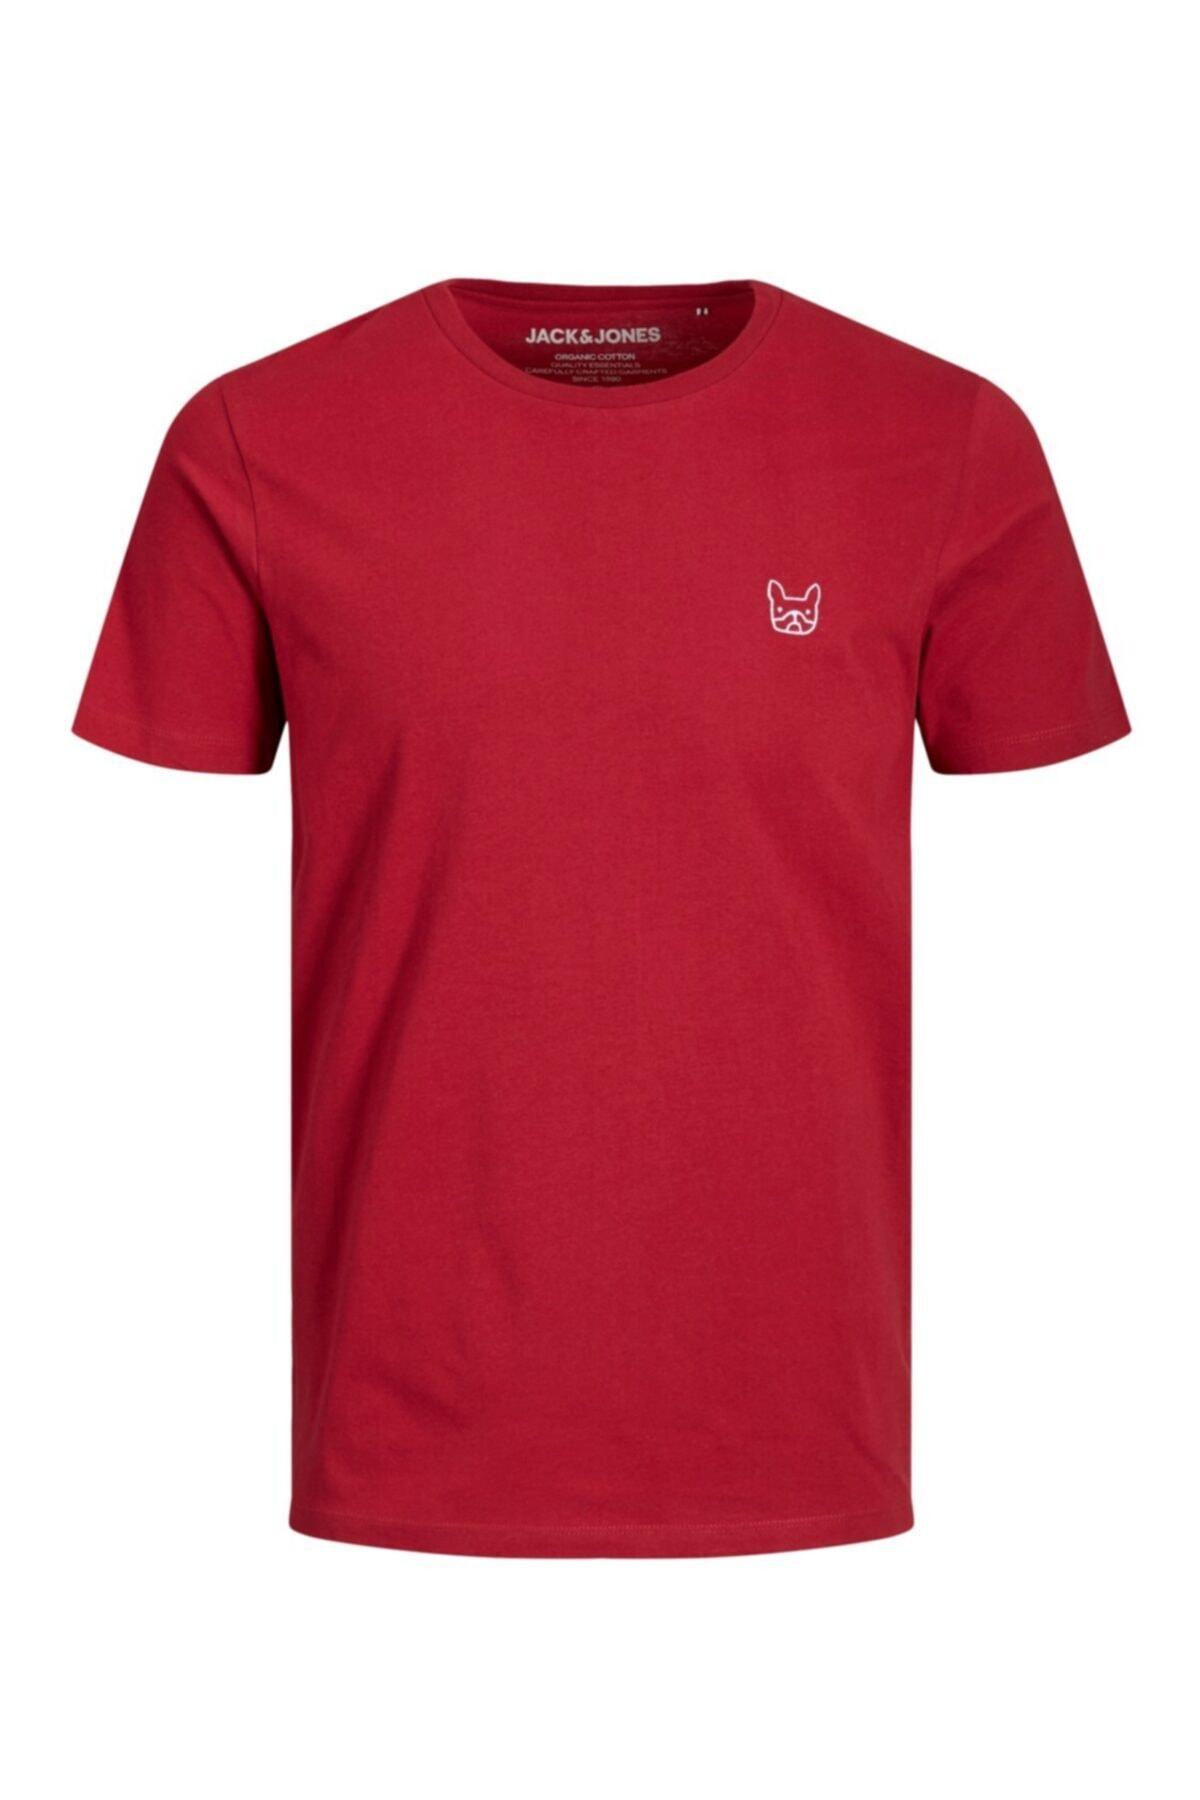 Jack & Jones 12164931 Erkek Jjedenım Logo Tee Ss O-neck Noos Tops T-shirts 1